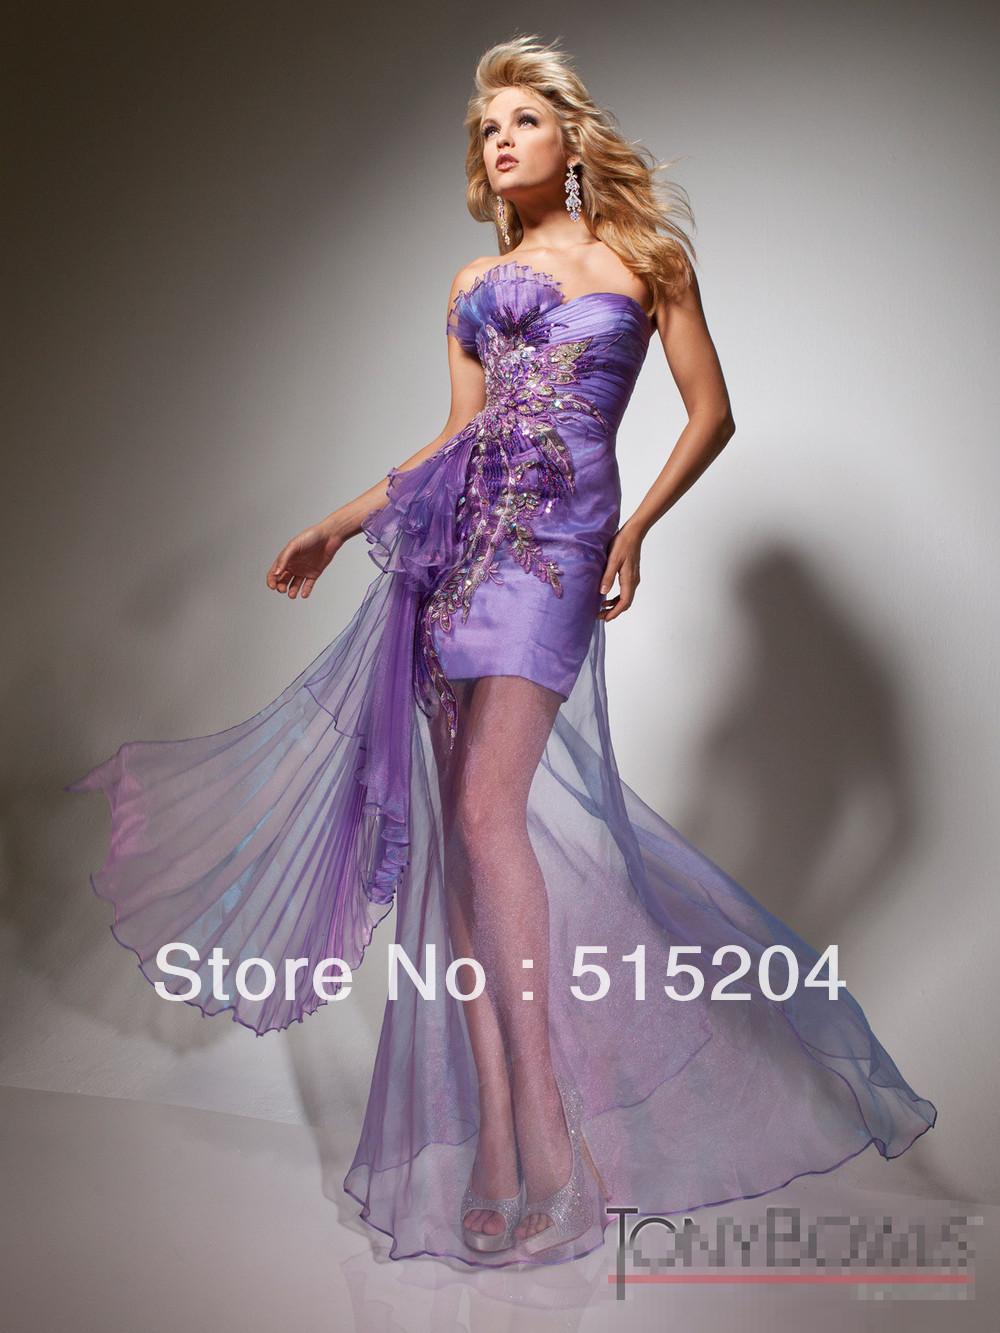 Purple High Low Prom Dresses 2013 - intellego